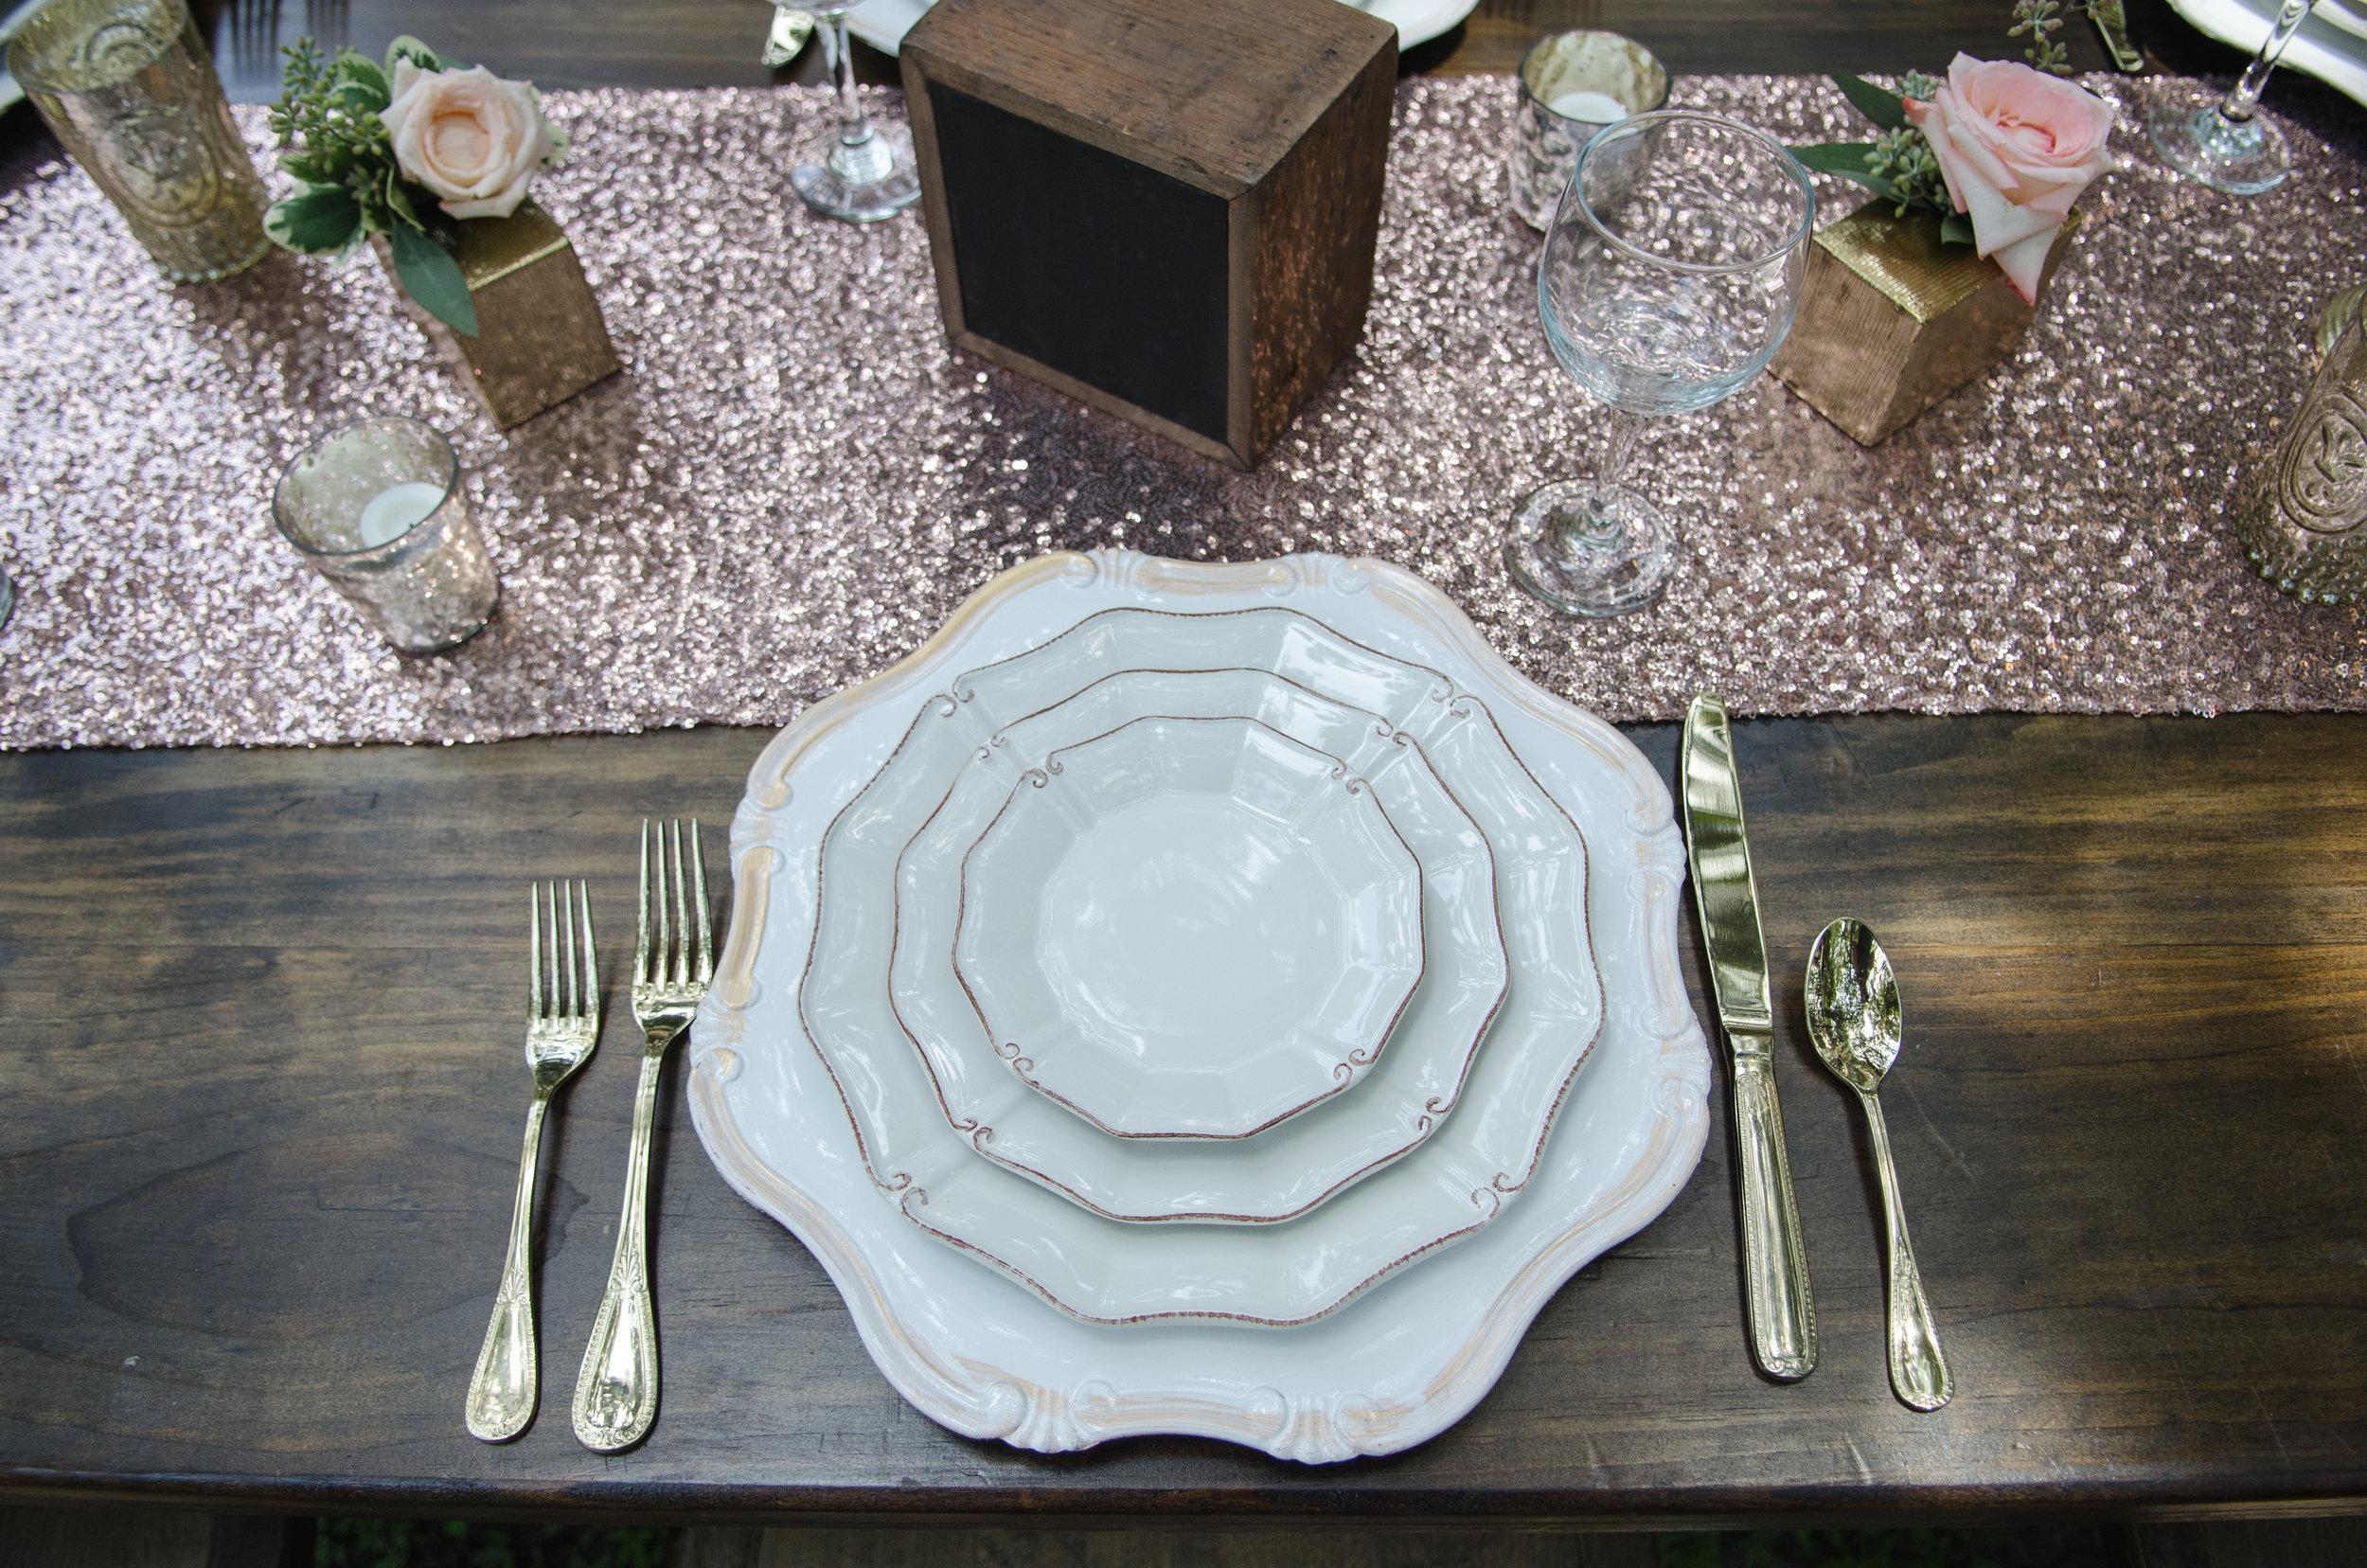 Villa de Este Dinnerware with Gold Flatware